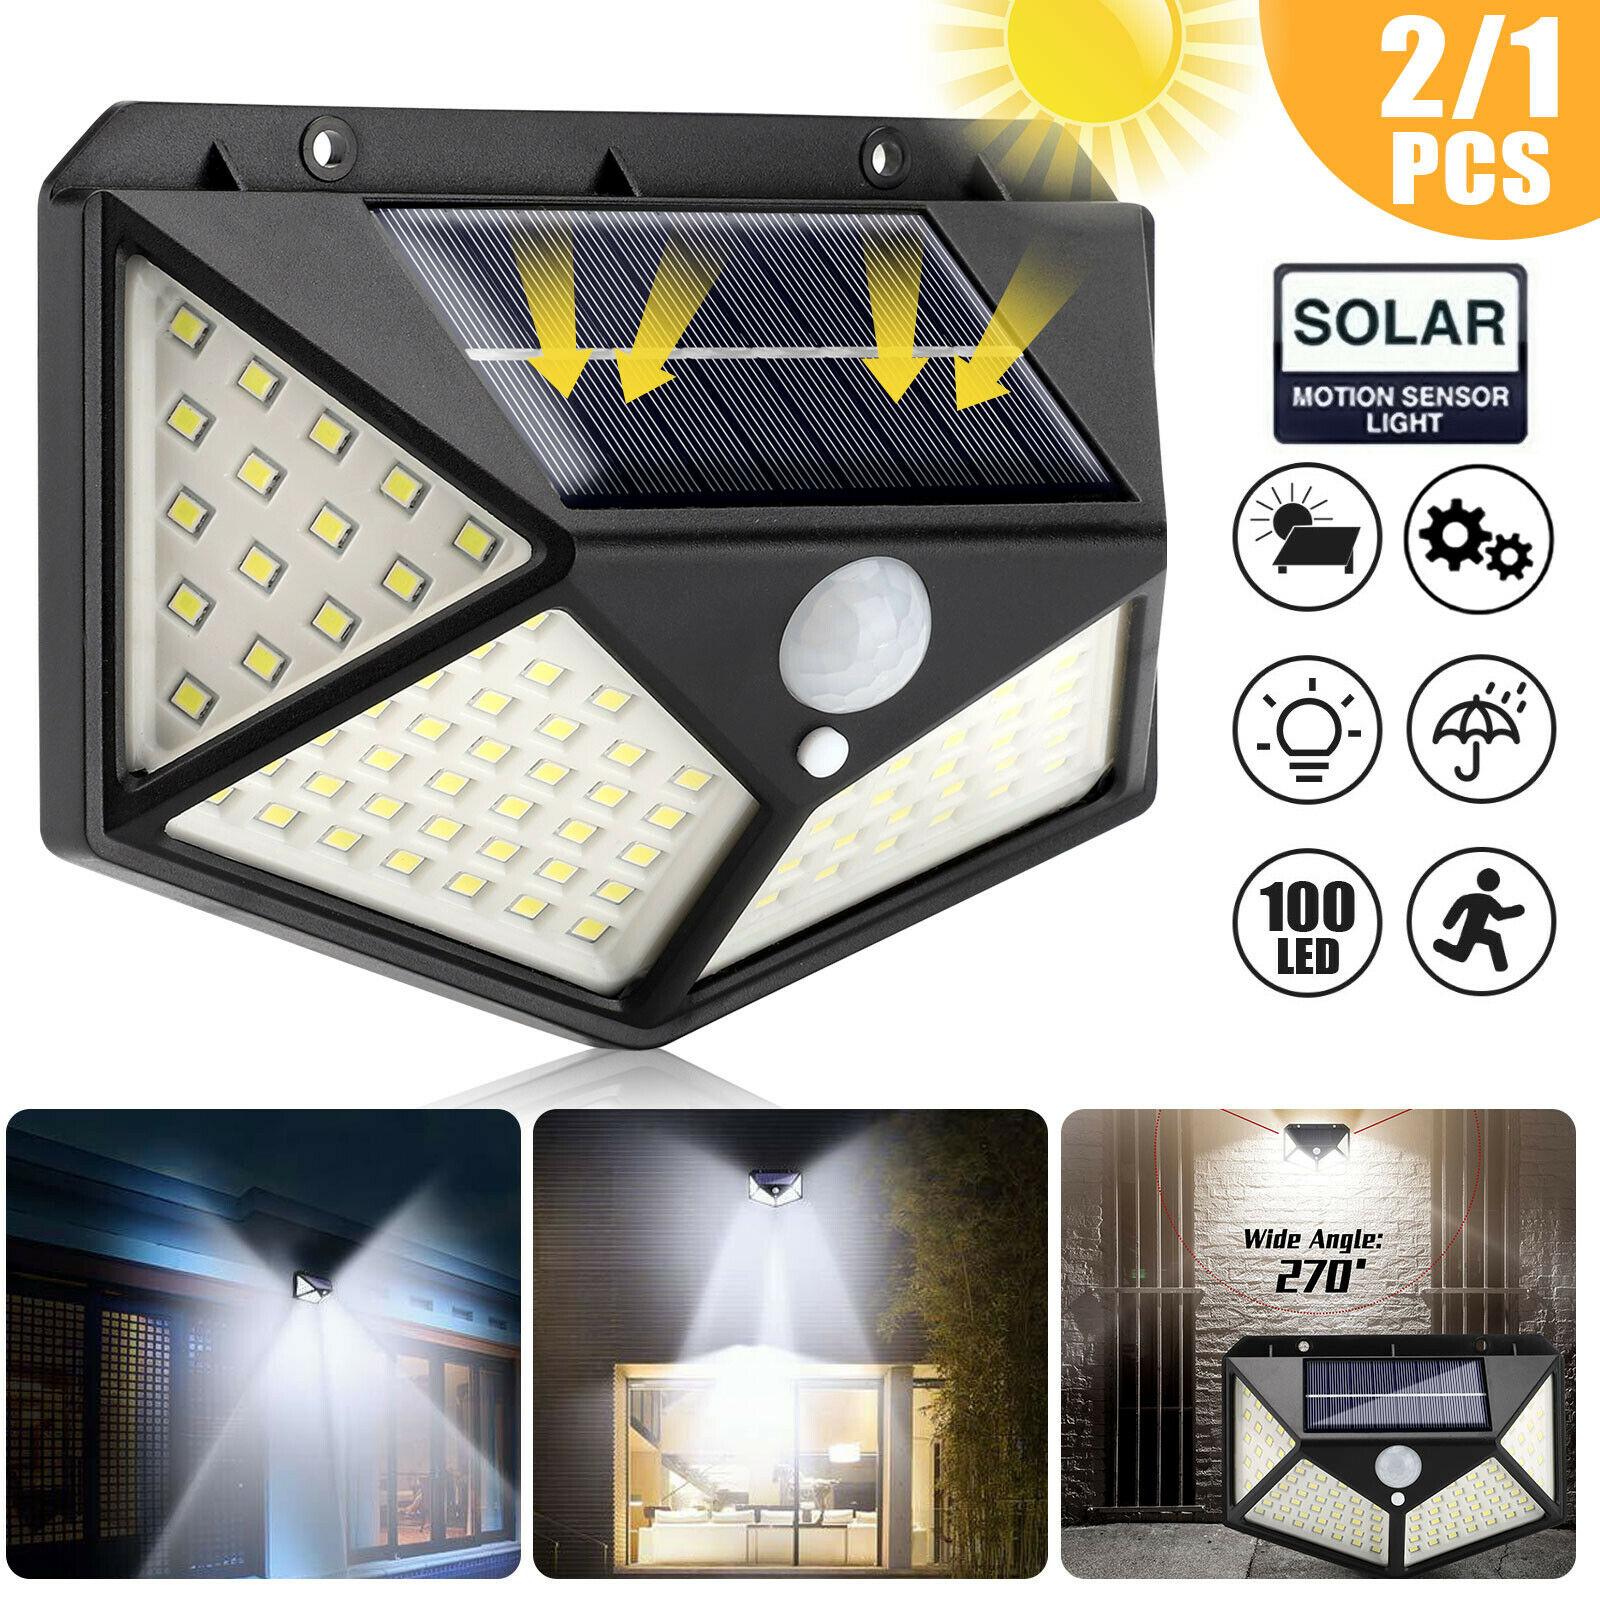 Lámpara Led Solar impermeable para exteriores con Sensor de movimiento, 100 LED, SHOPLED